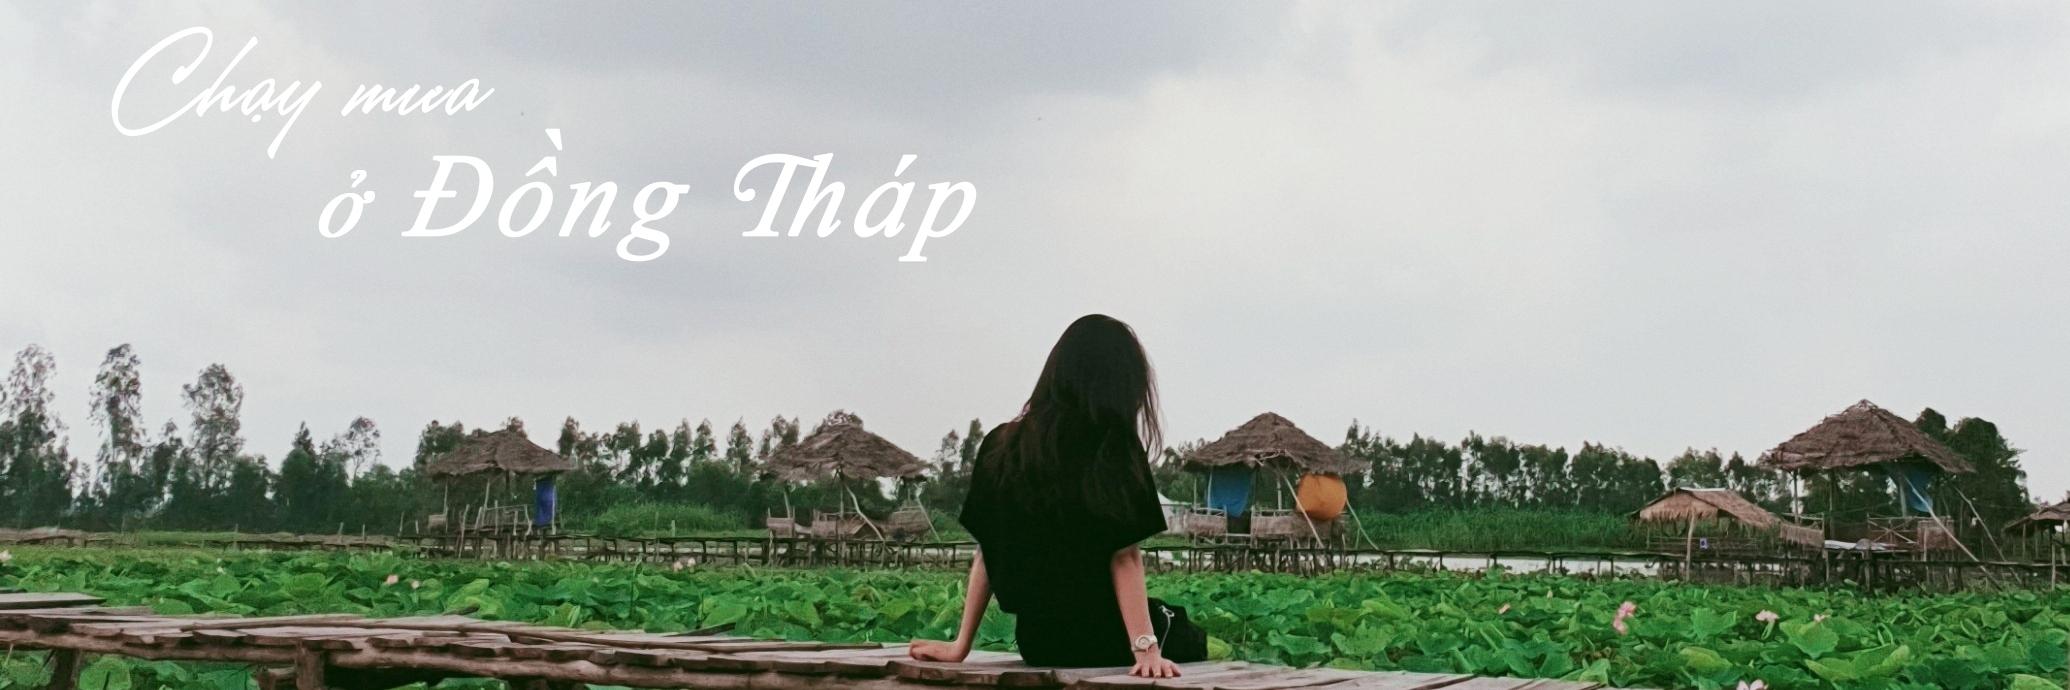 https://gody.vn/blog/letranghou4181/post/chay-mua-o-dong-thap-kham-pha-dac-san-mien-tay-5318